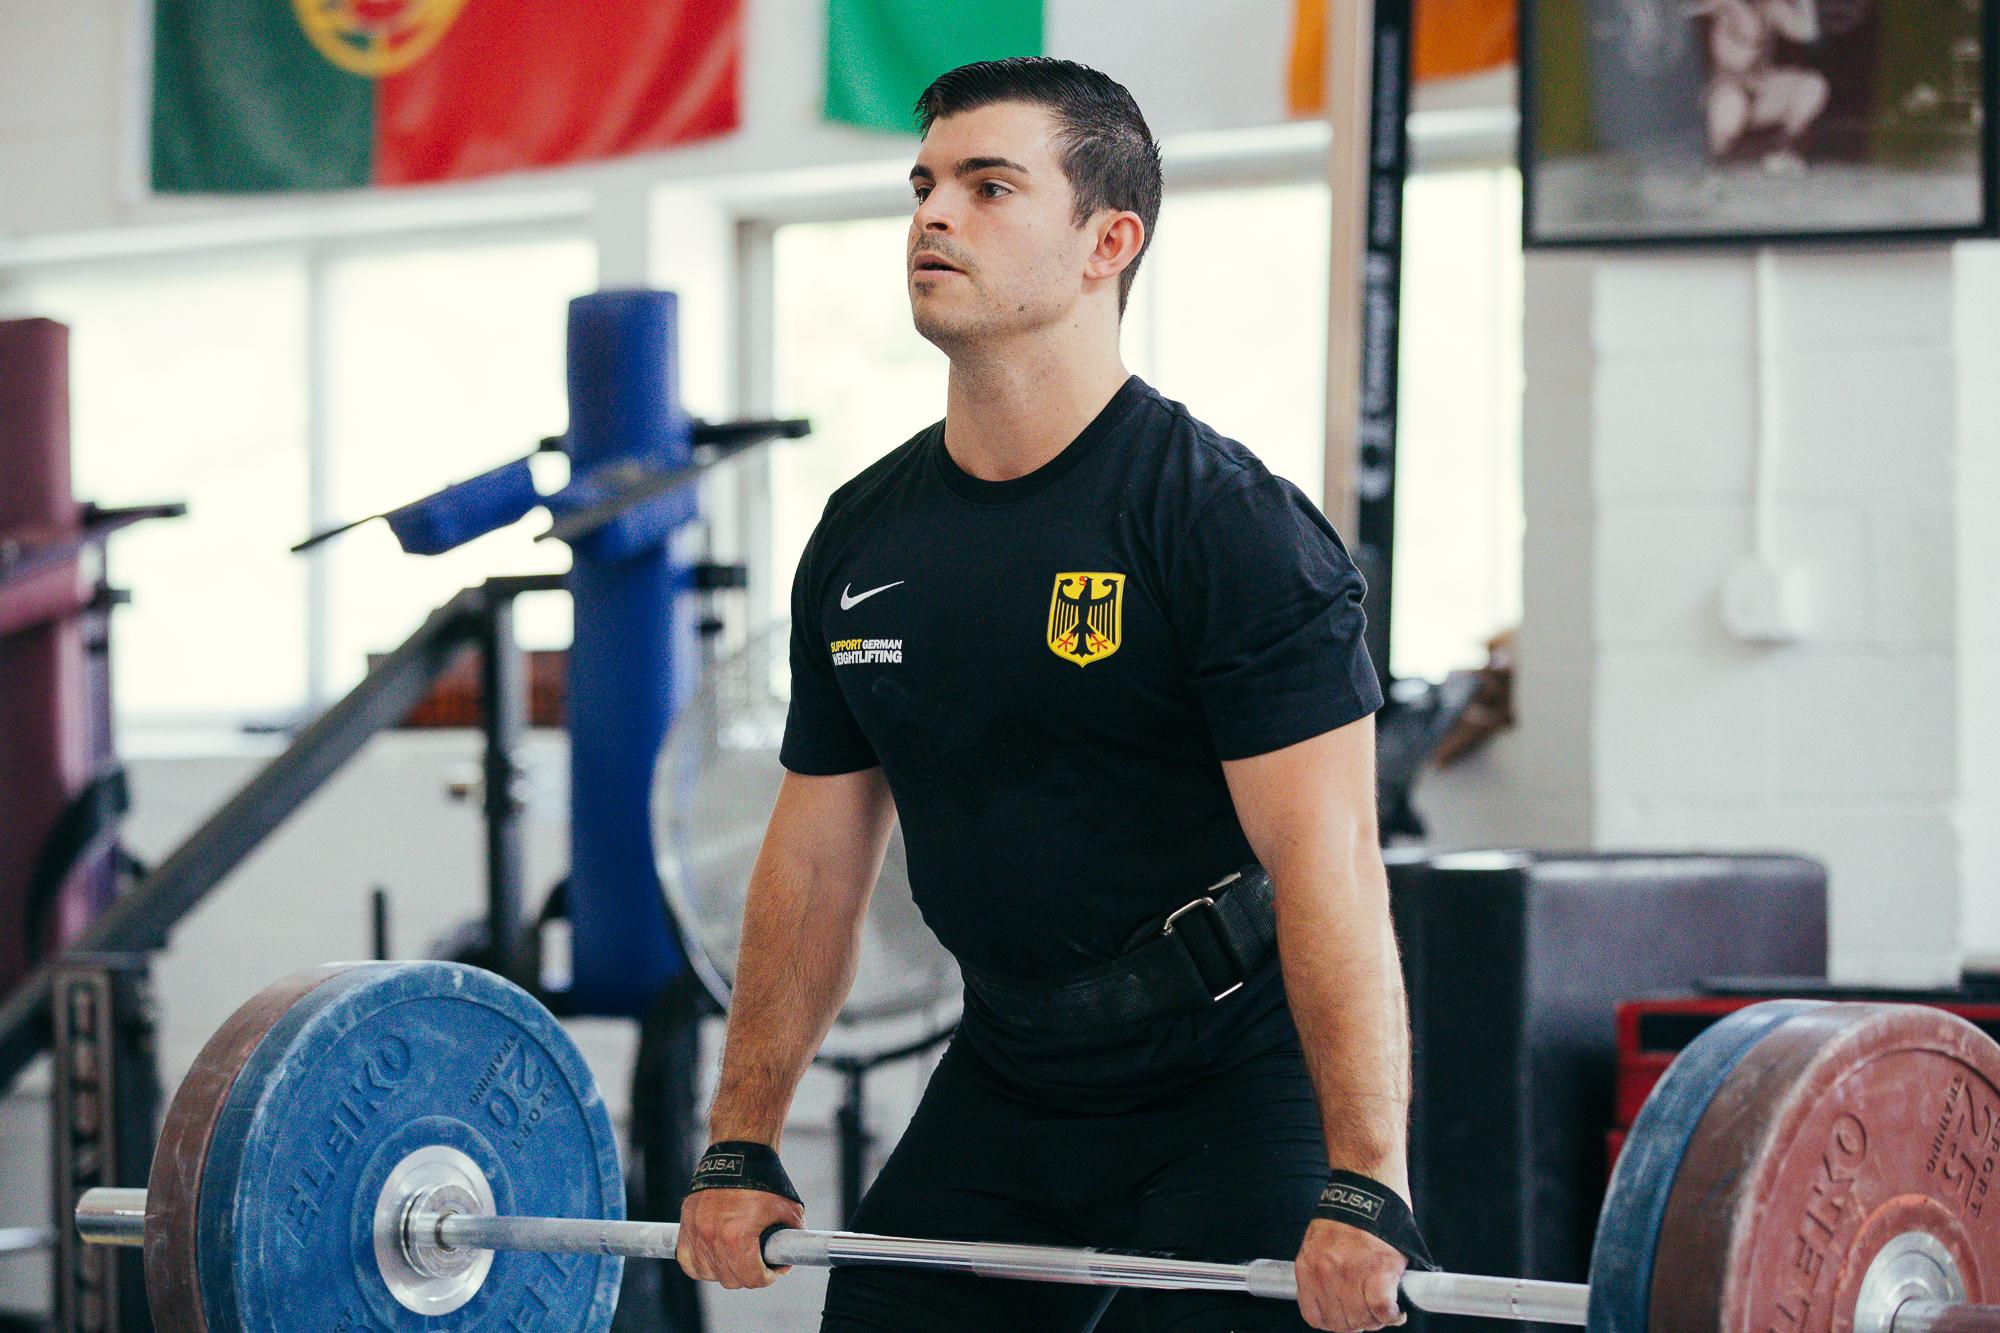 august-nywa-training-weightlifting-photos-by-everyday-lifters-viviana-podhaiski-11.jpg